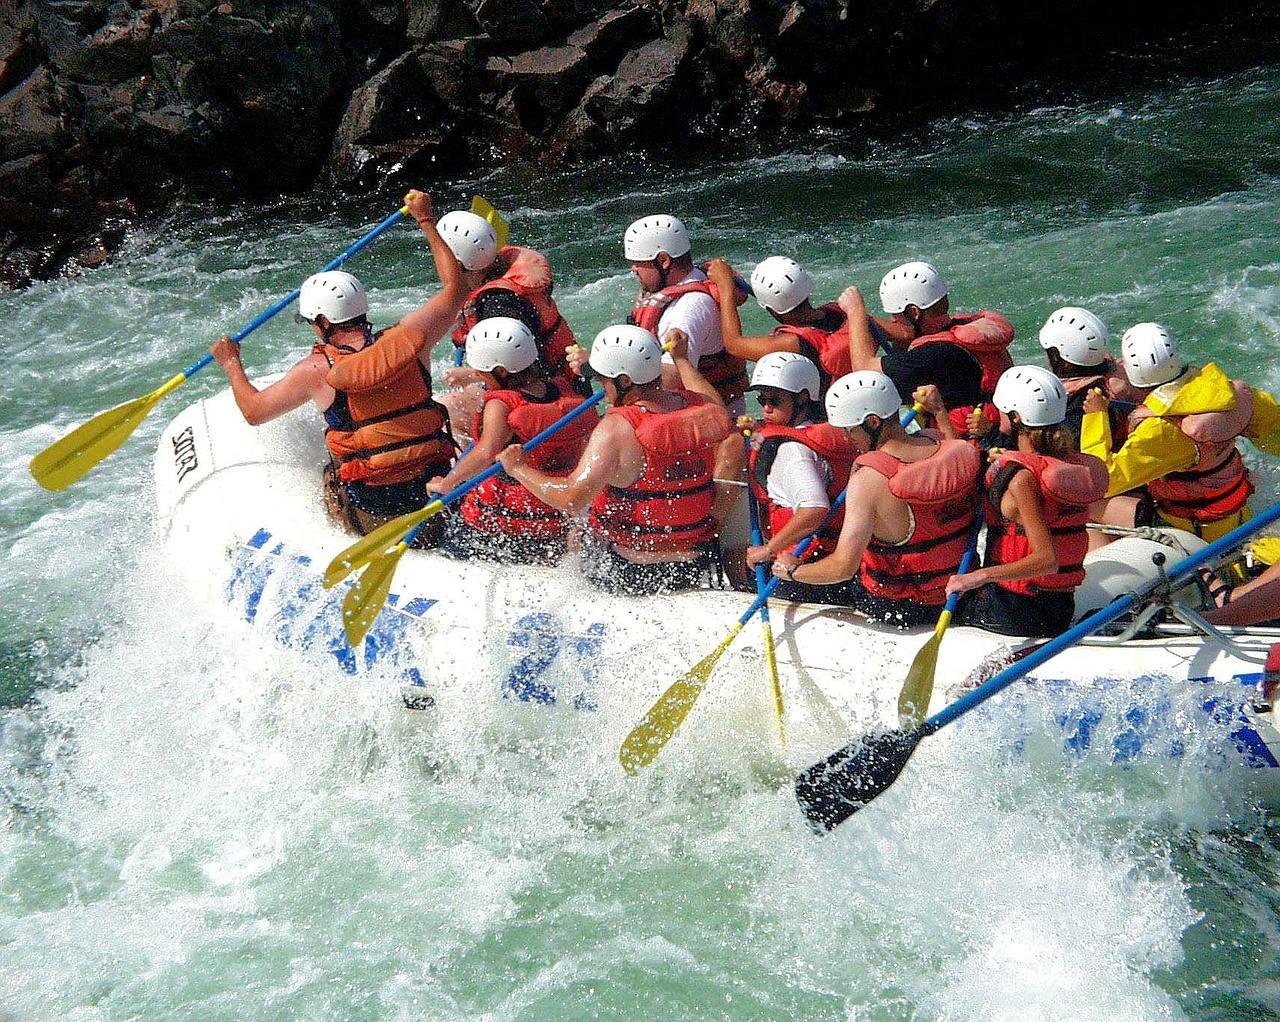 Denizli Bekili Deresi Rafting